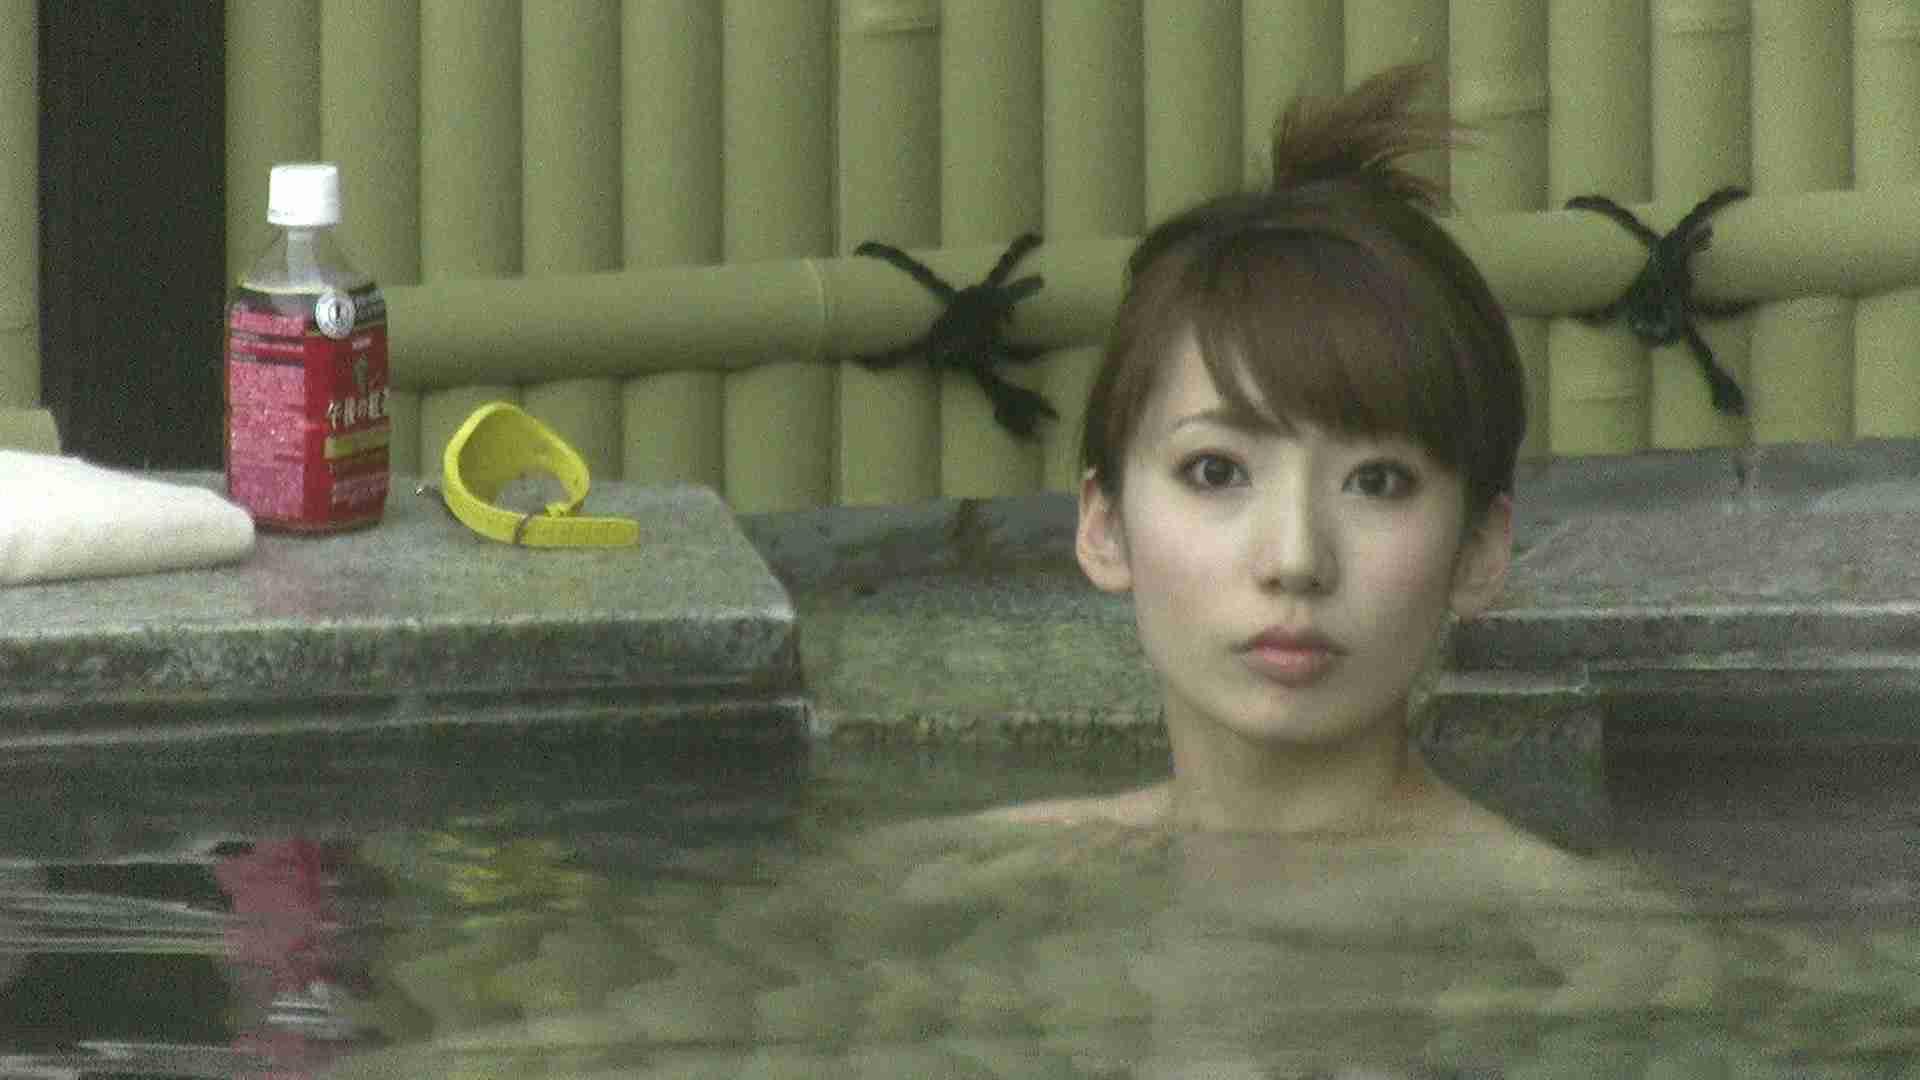 Aquaな露天風呂Vol.208 OLセックス  85画像 12